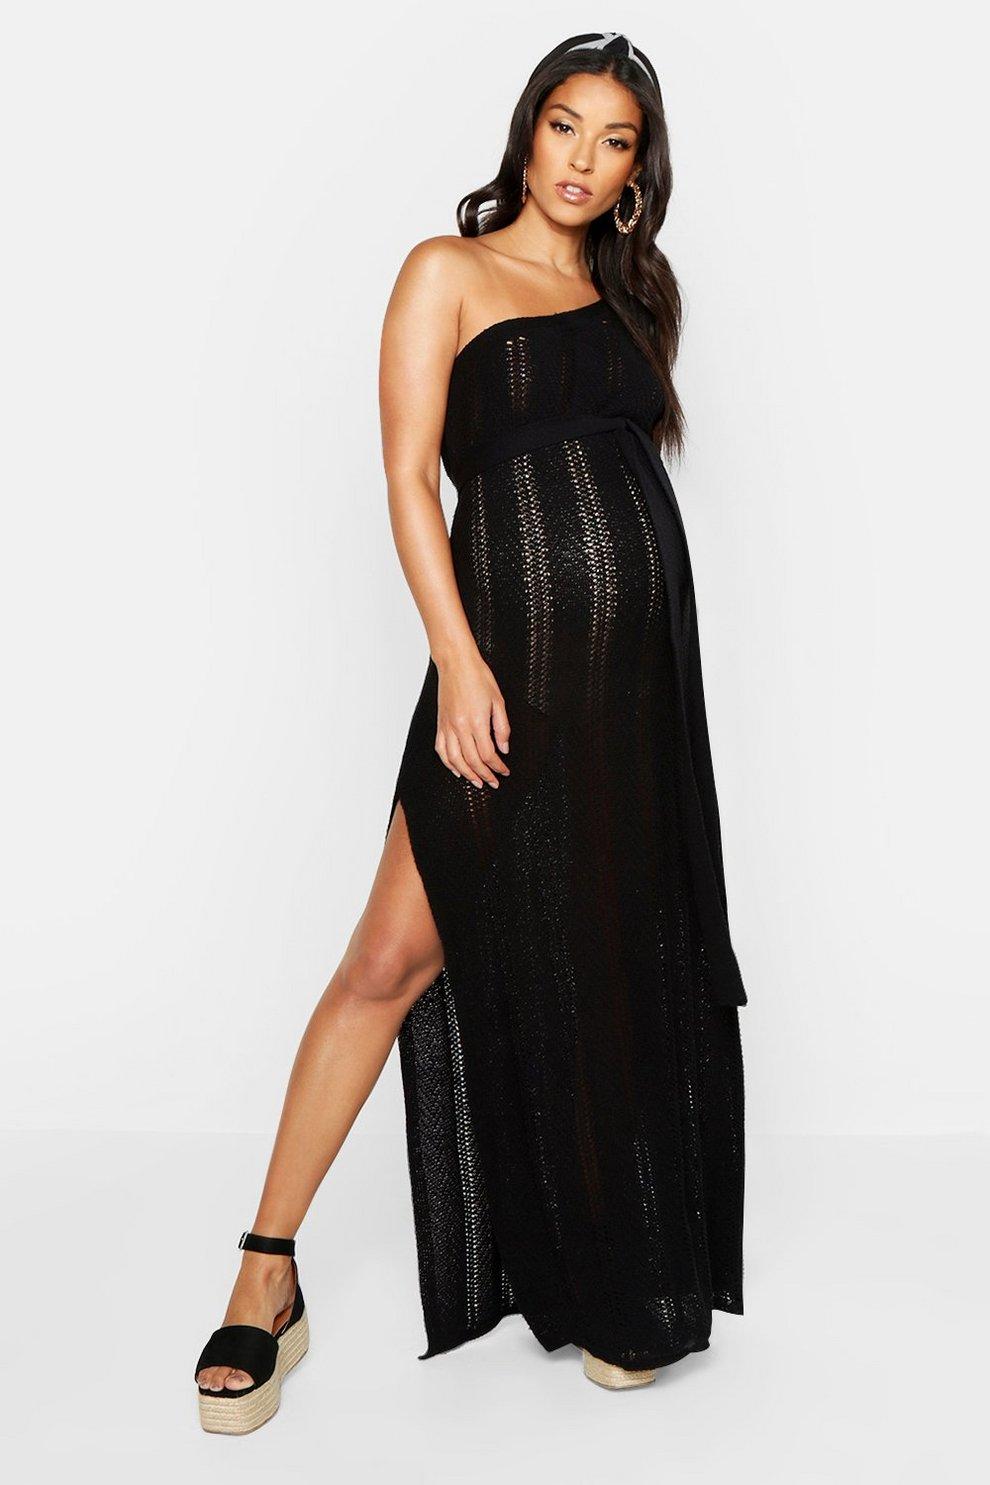 6d0fc9e98d63 Maternity One Shoulder Knitted Beach Dress | Boohoo